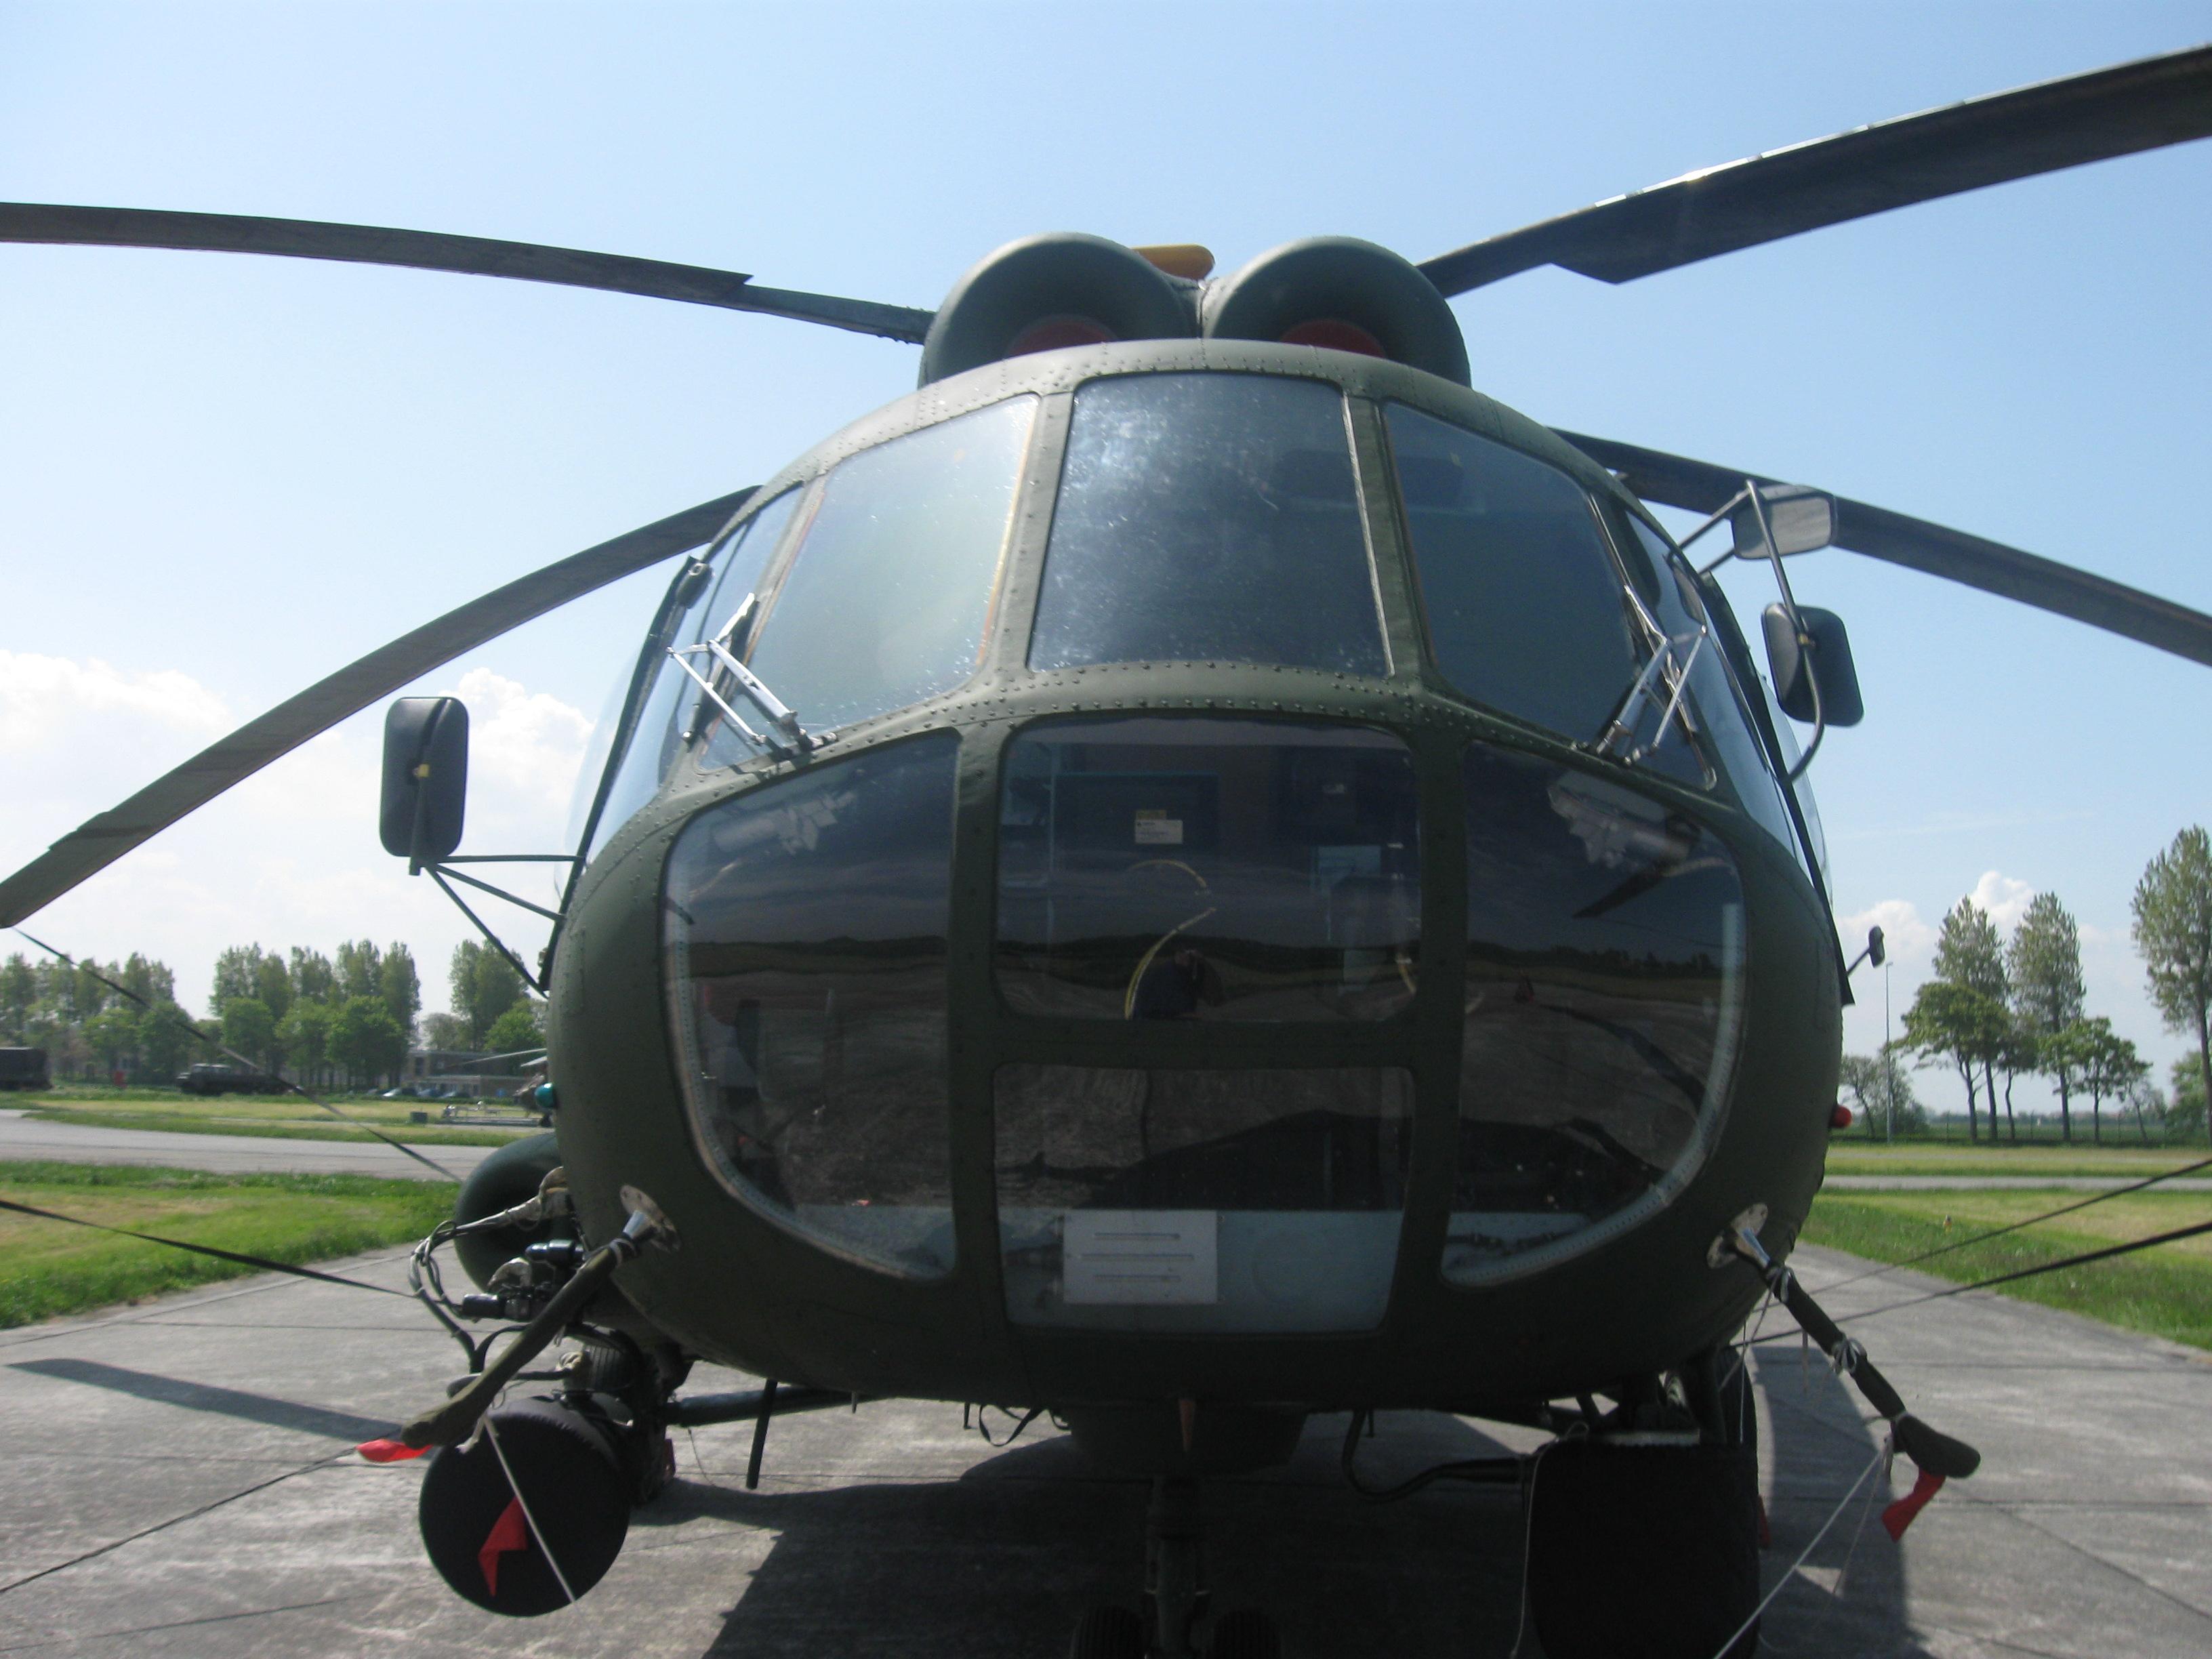 Helico's : divers, photos, infos 1005180812031050246058958